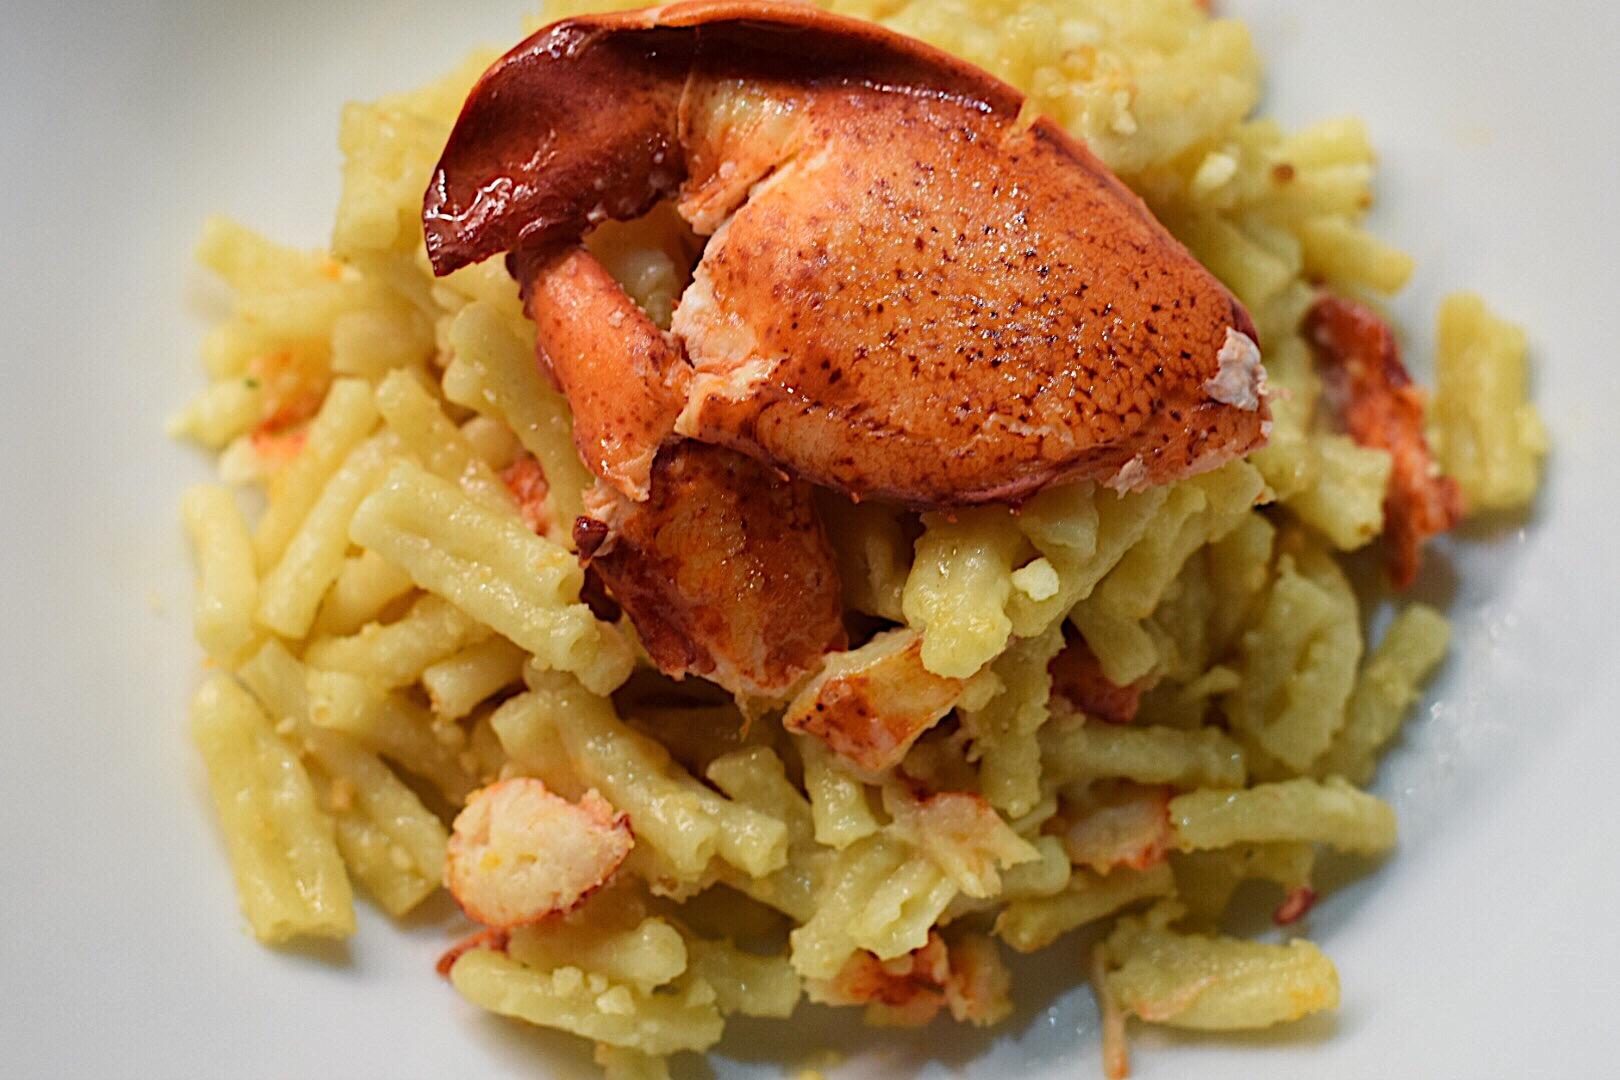 Lobstah mac n' cheese